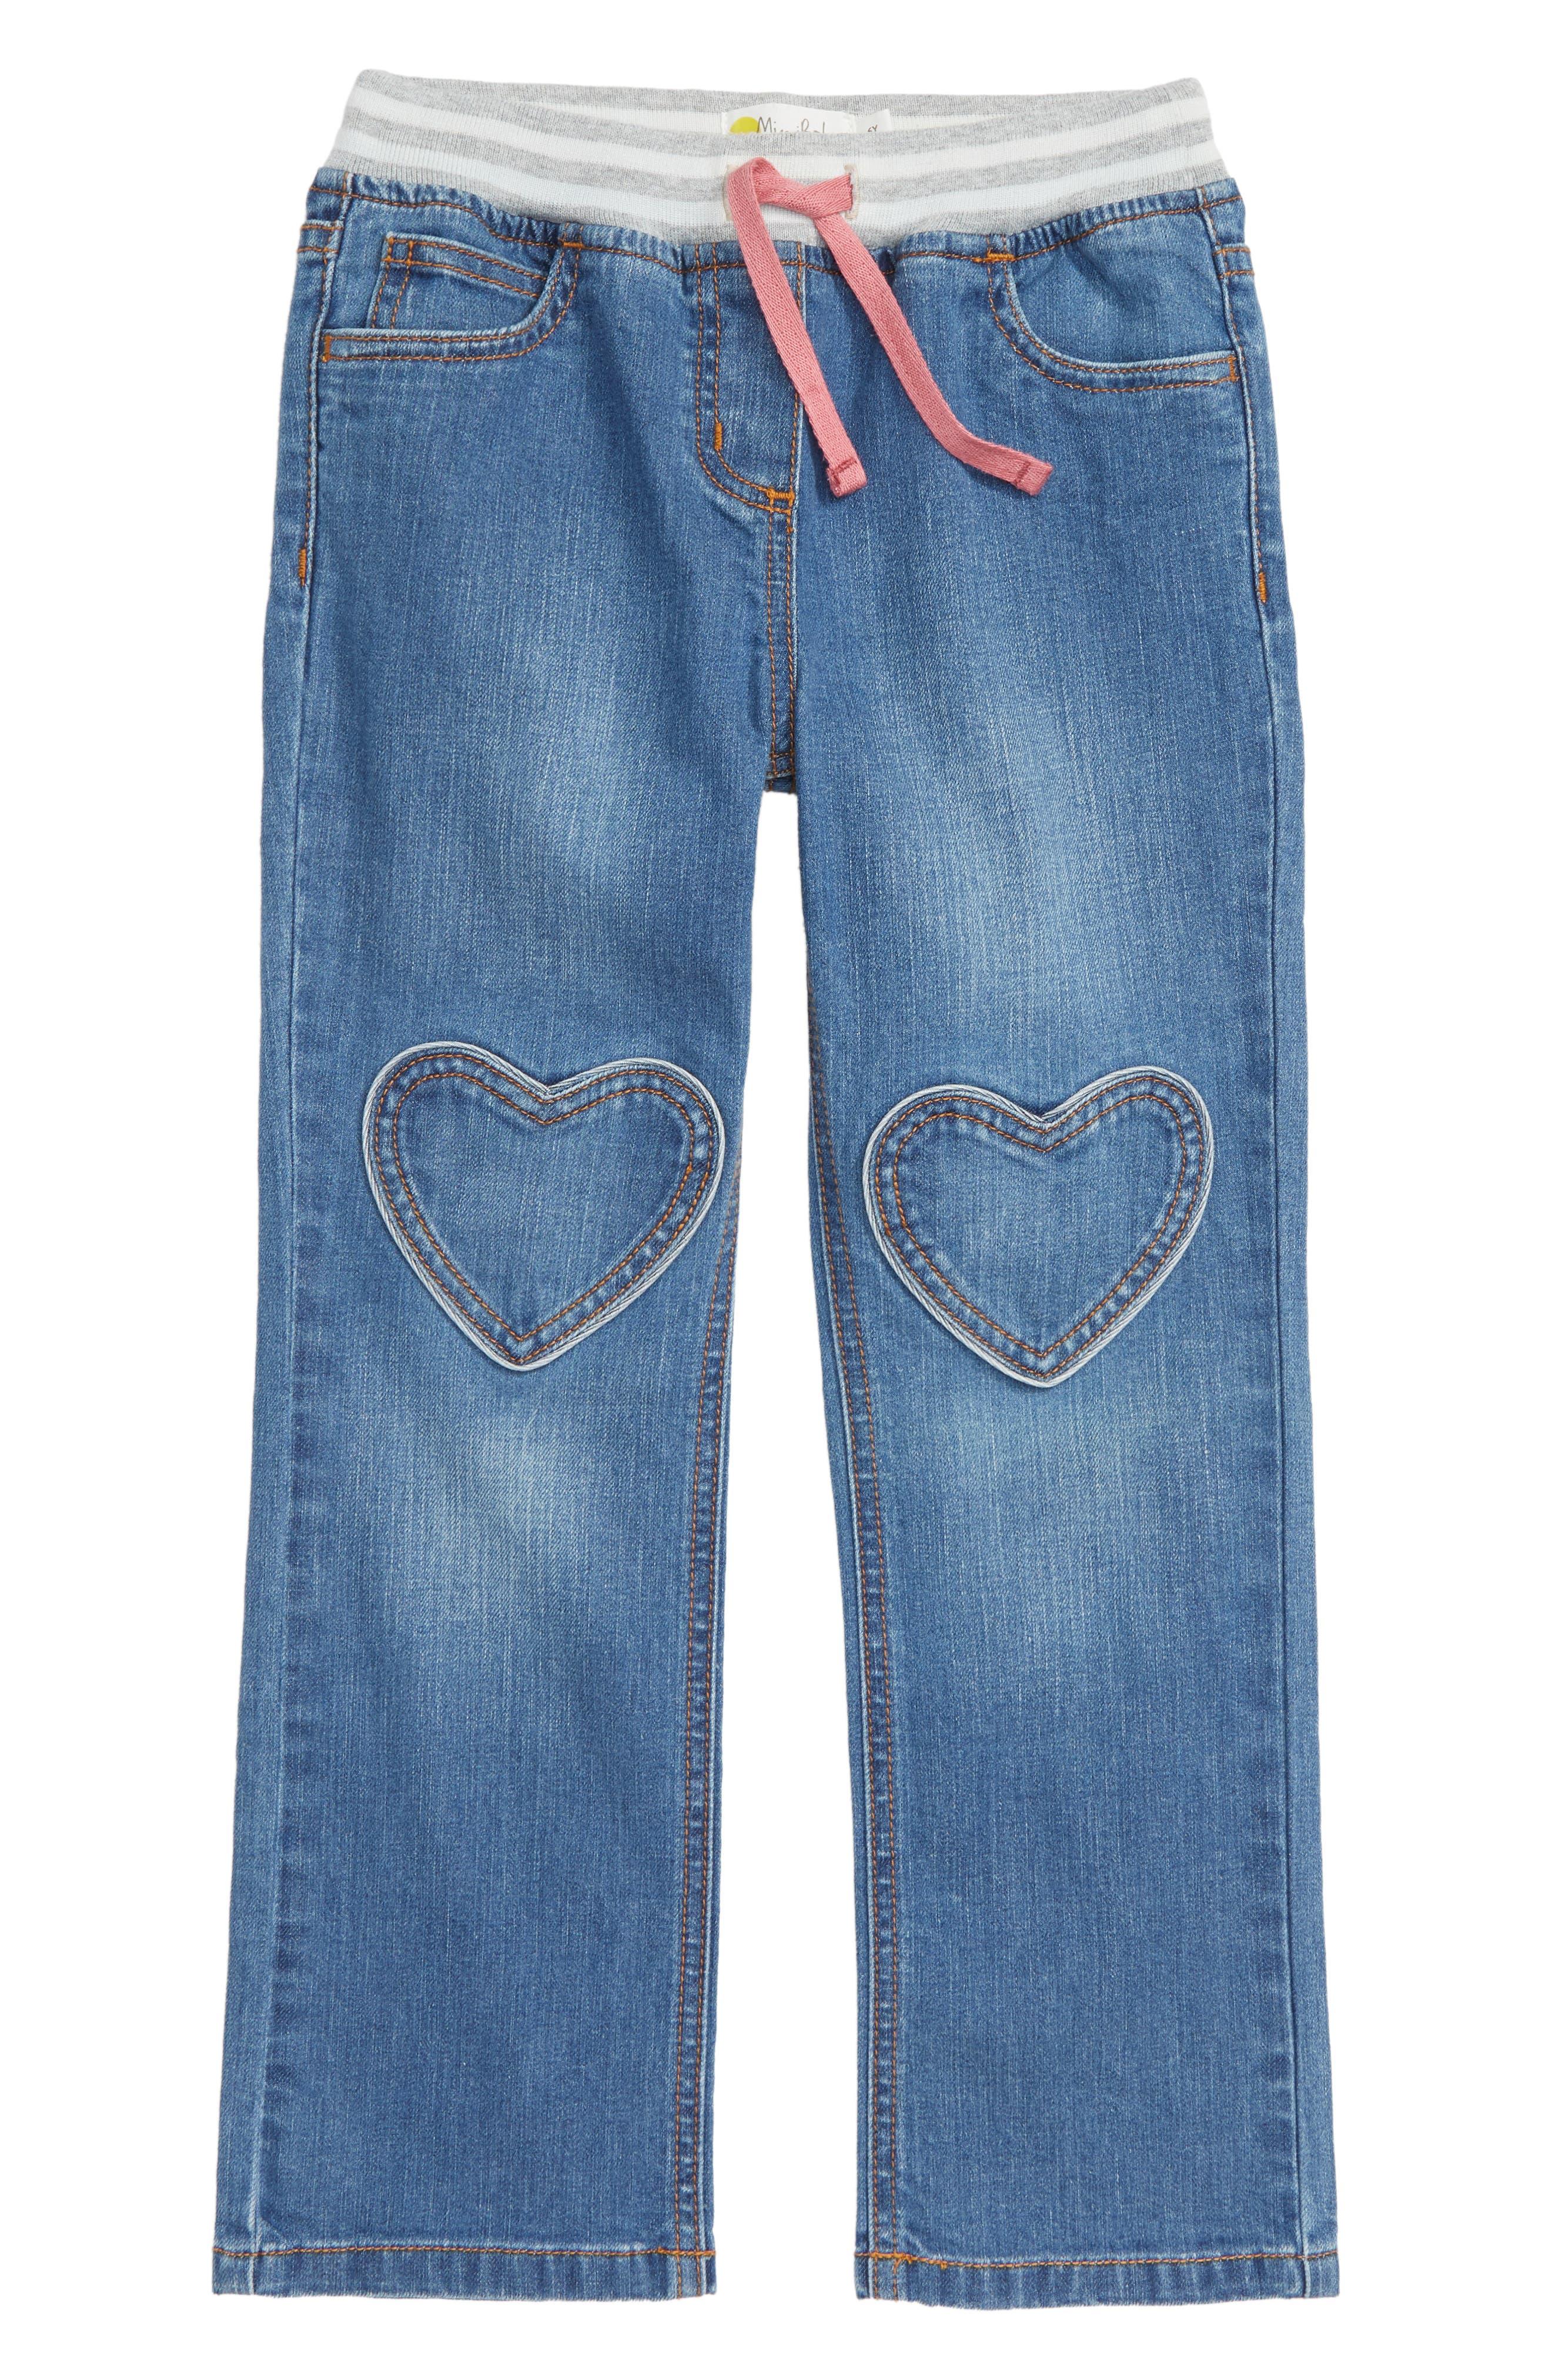 Heart Patch Jeans,                             Main thumbnail 1, color,                             MID VINTAGE